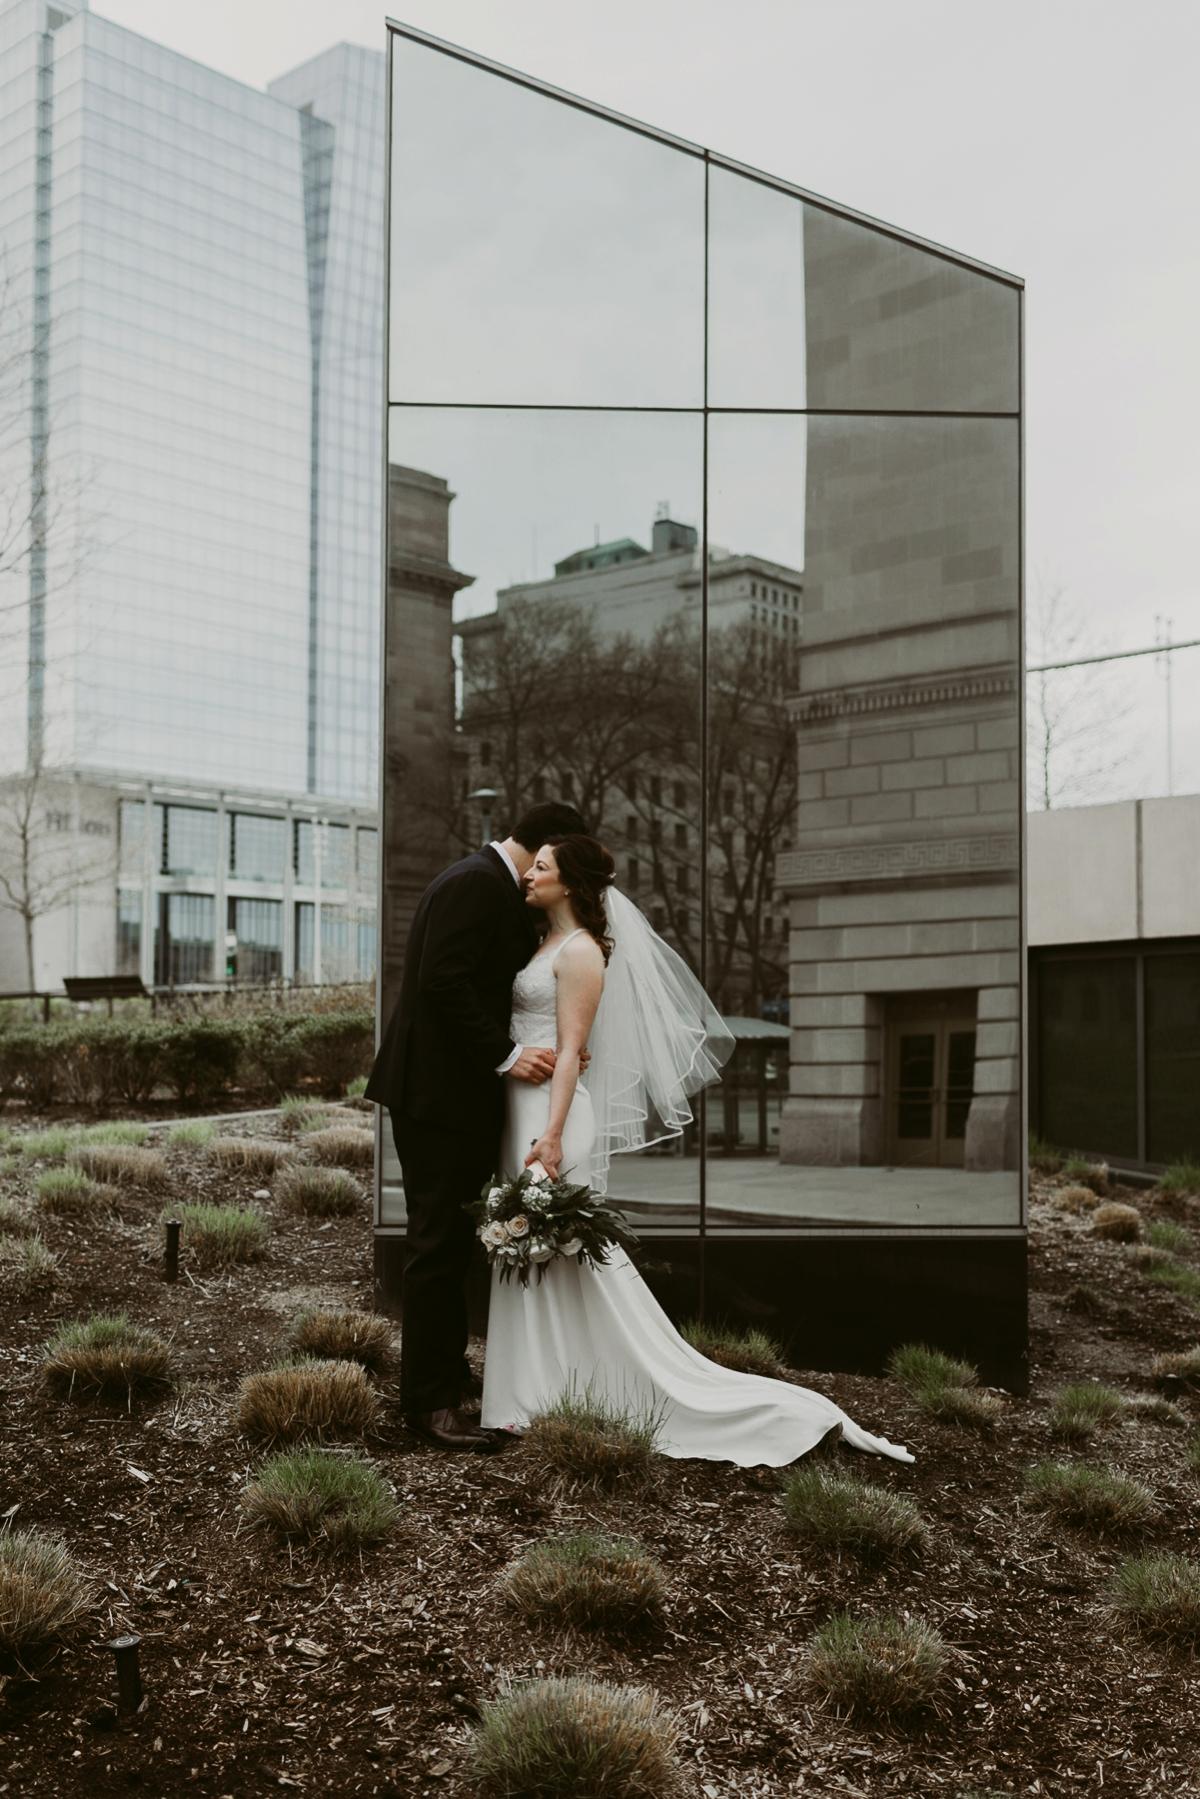 Rachel+Michael_Lake-Erie-Building-Cleveland-Wedding_M+J-Photographers-120.jpg